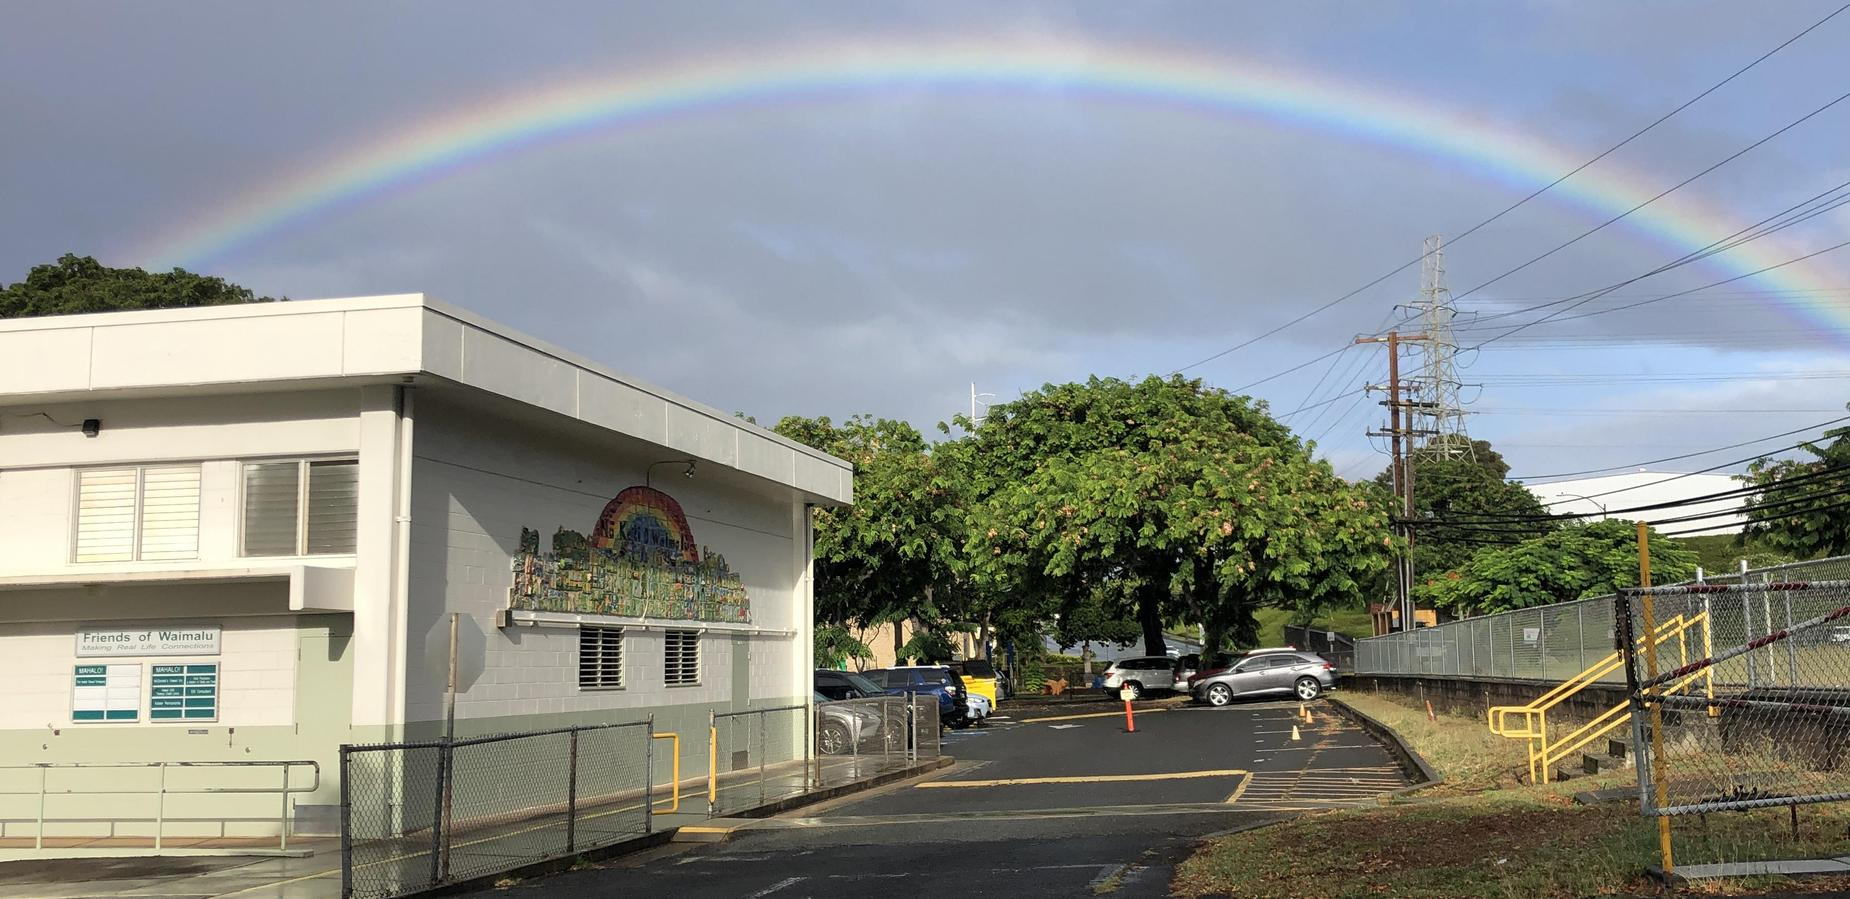 Rainbow above Waimalu